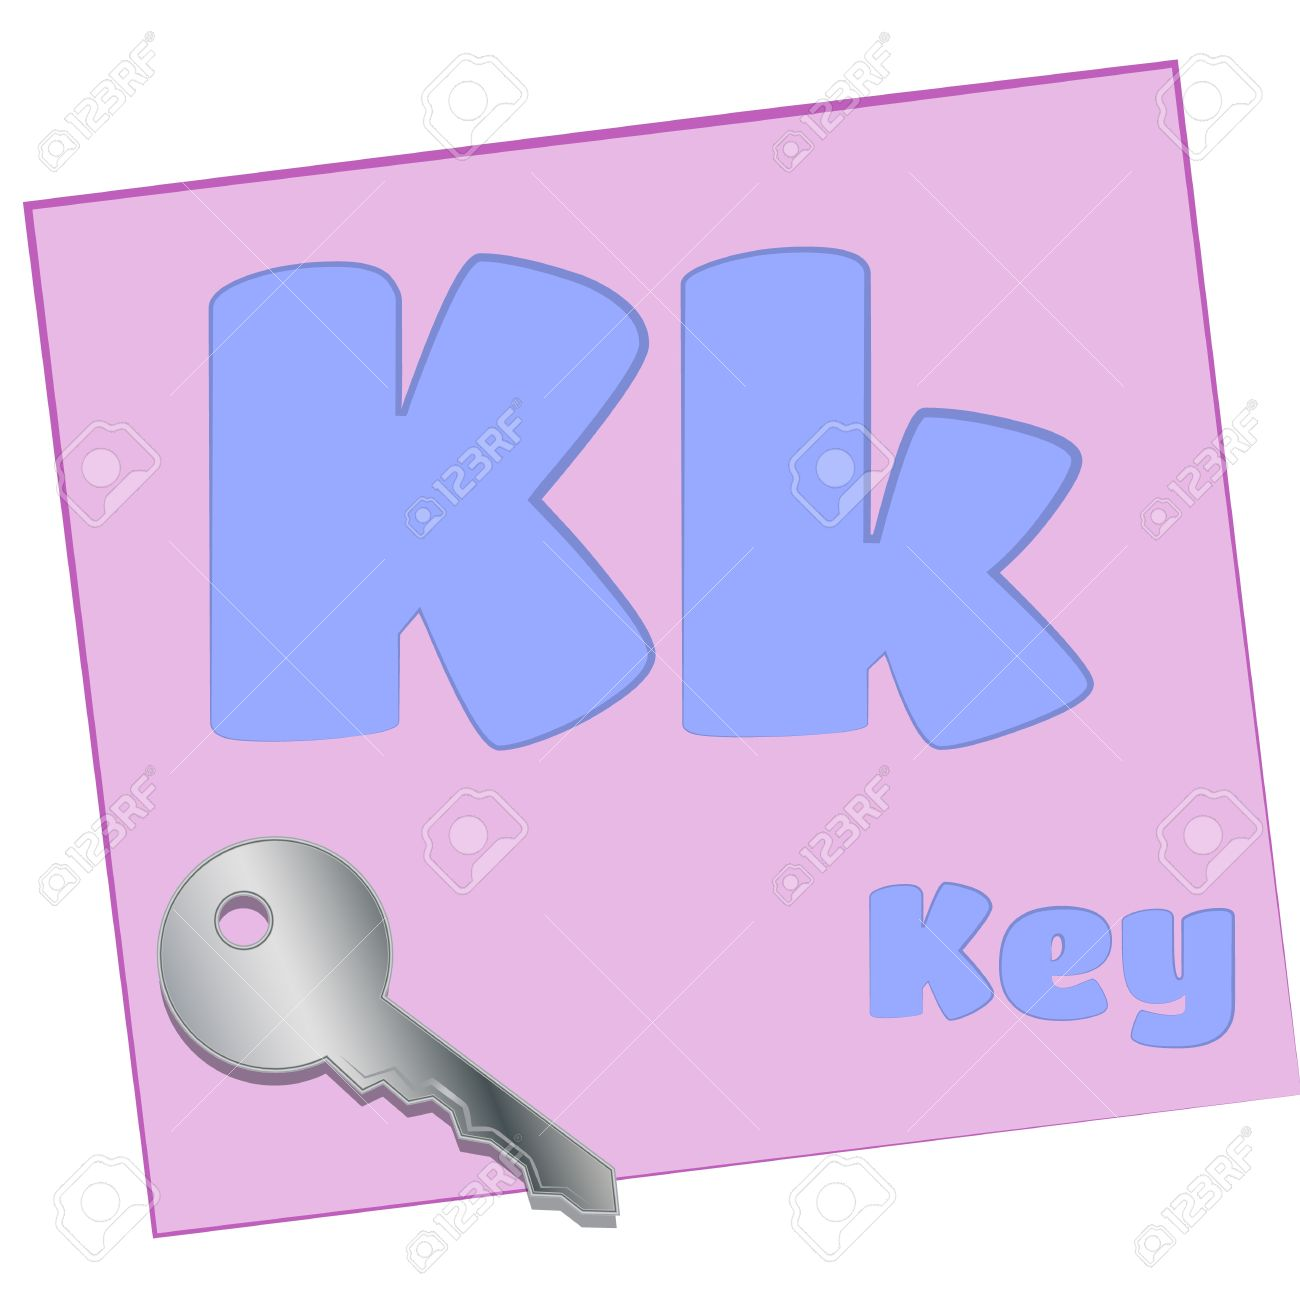 89 K Key Stock Vector Illustration And Royalty Free K Key Clipart